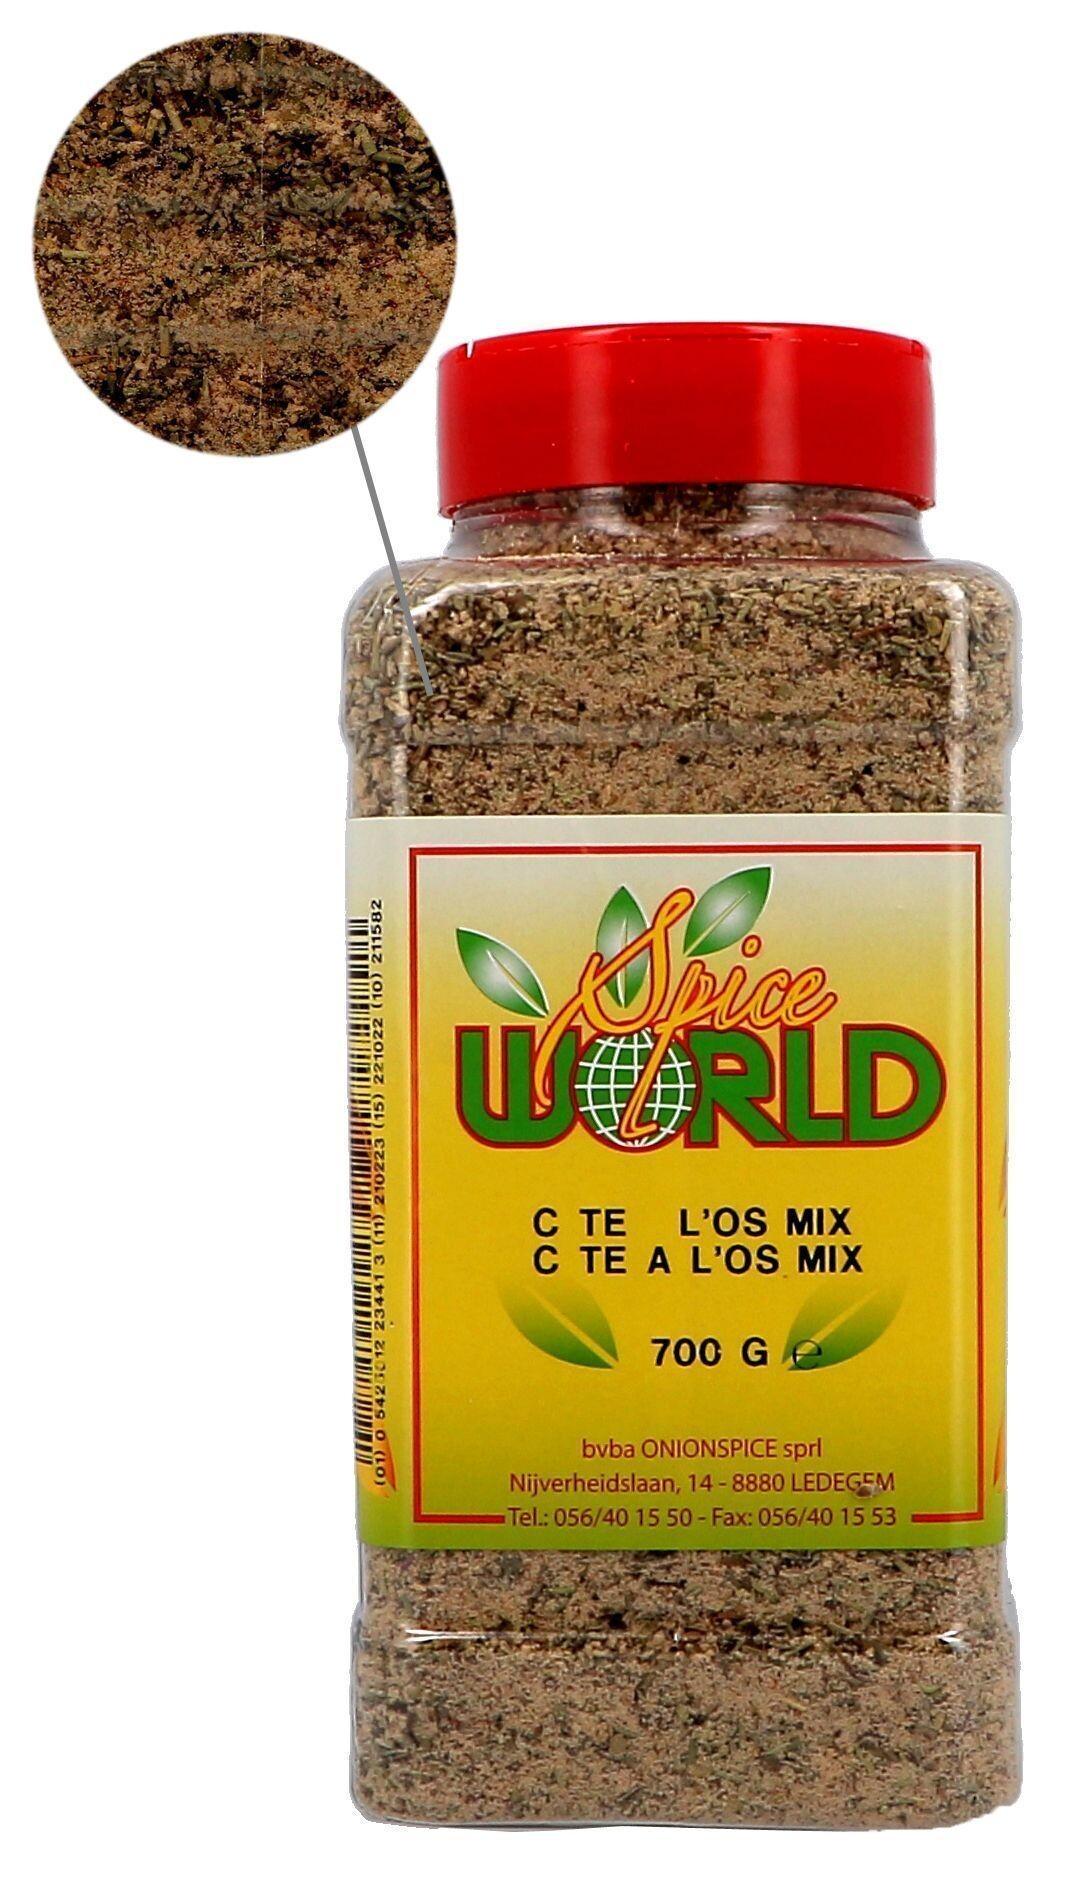 Cote a l'Os-mix kruiden 700gr Spice World (Isfi & Verstegen)